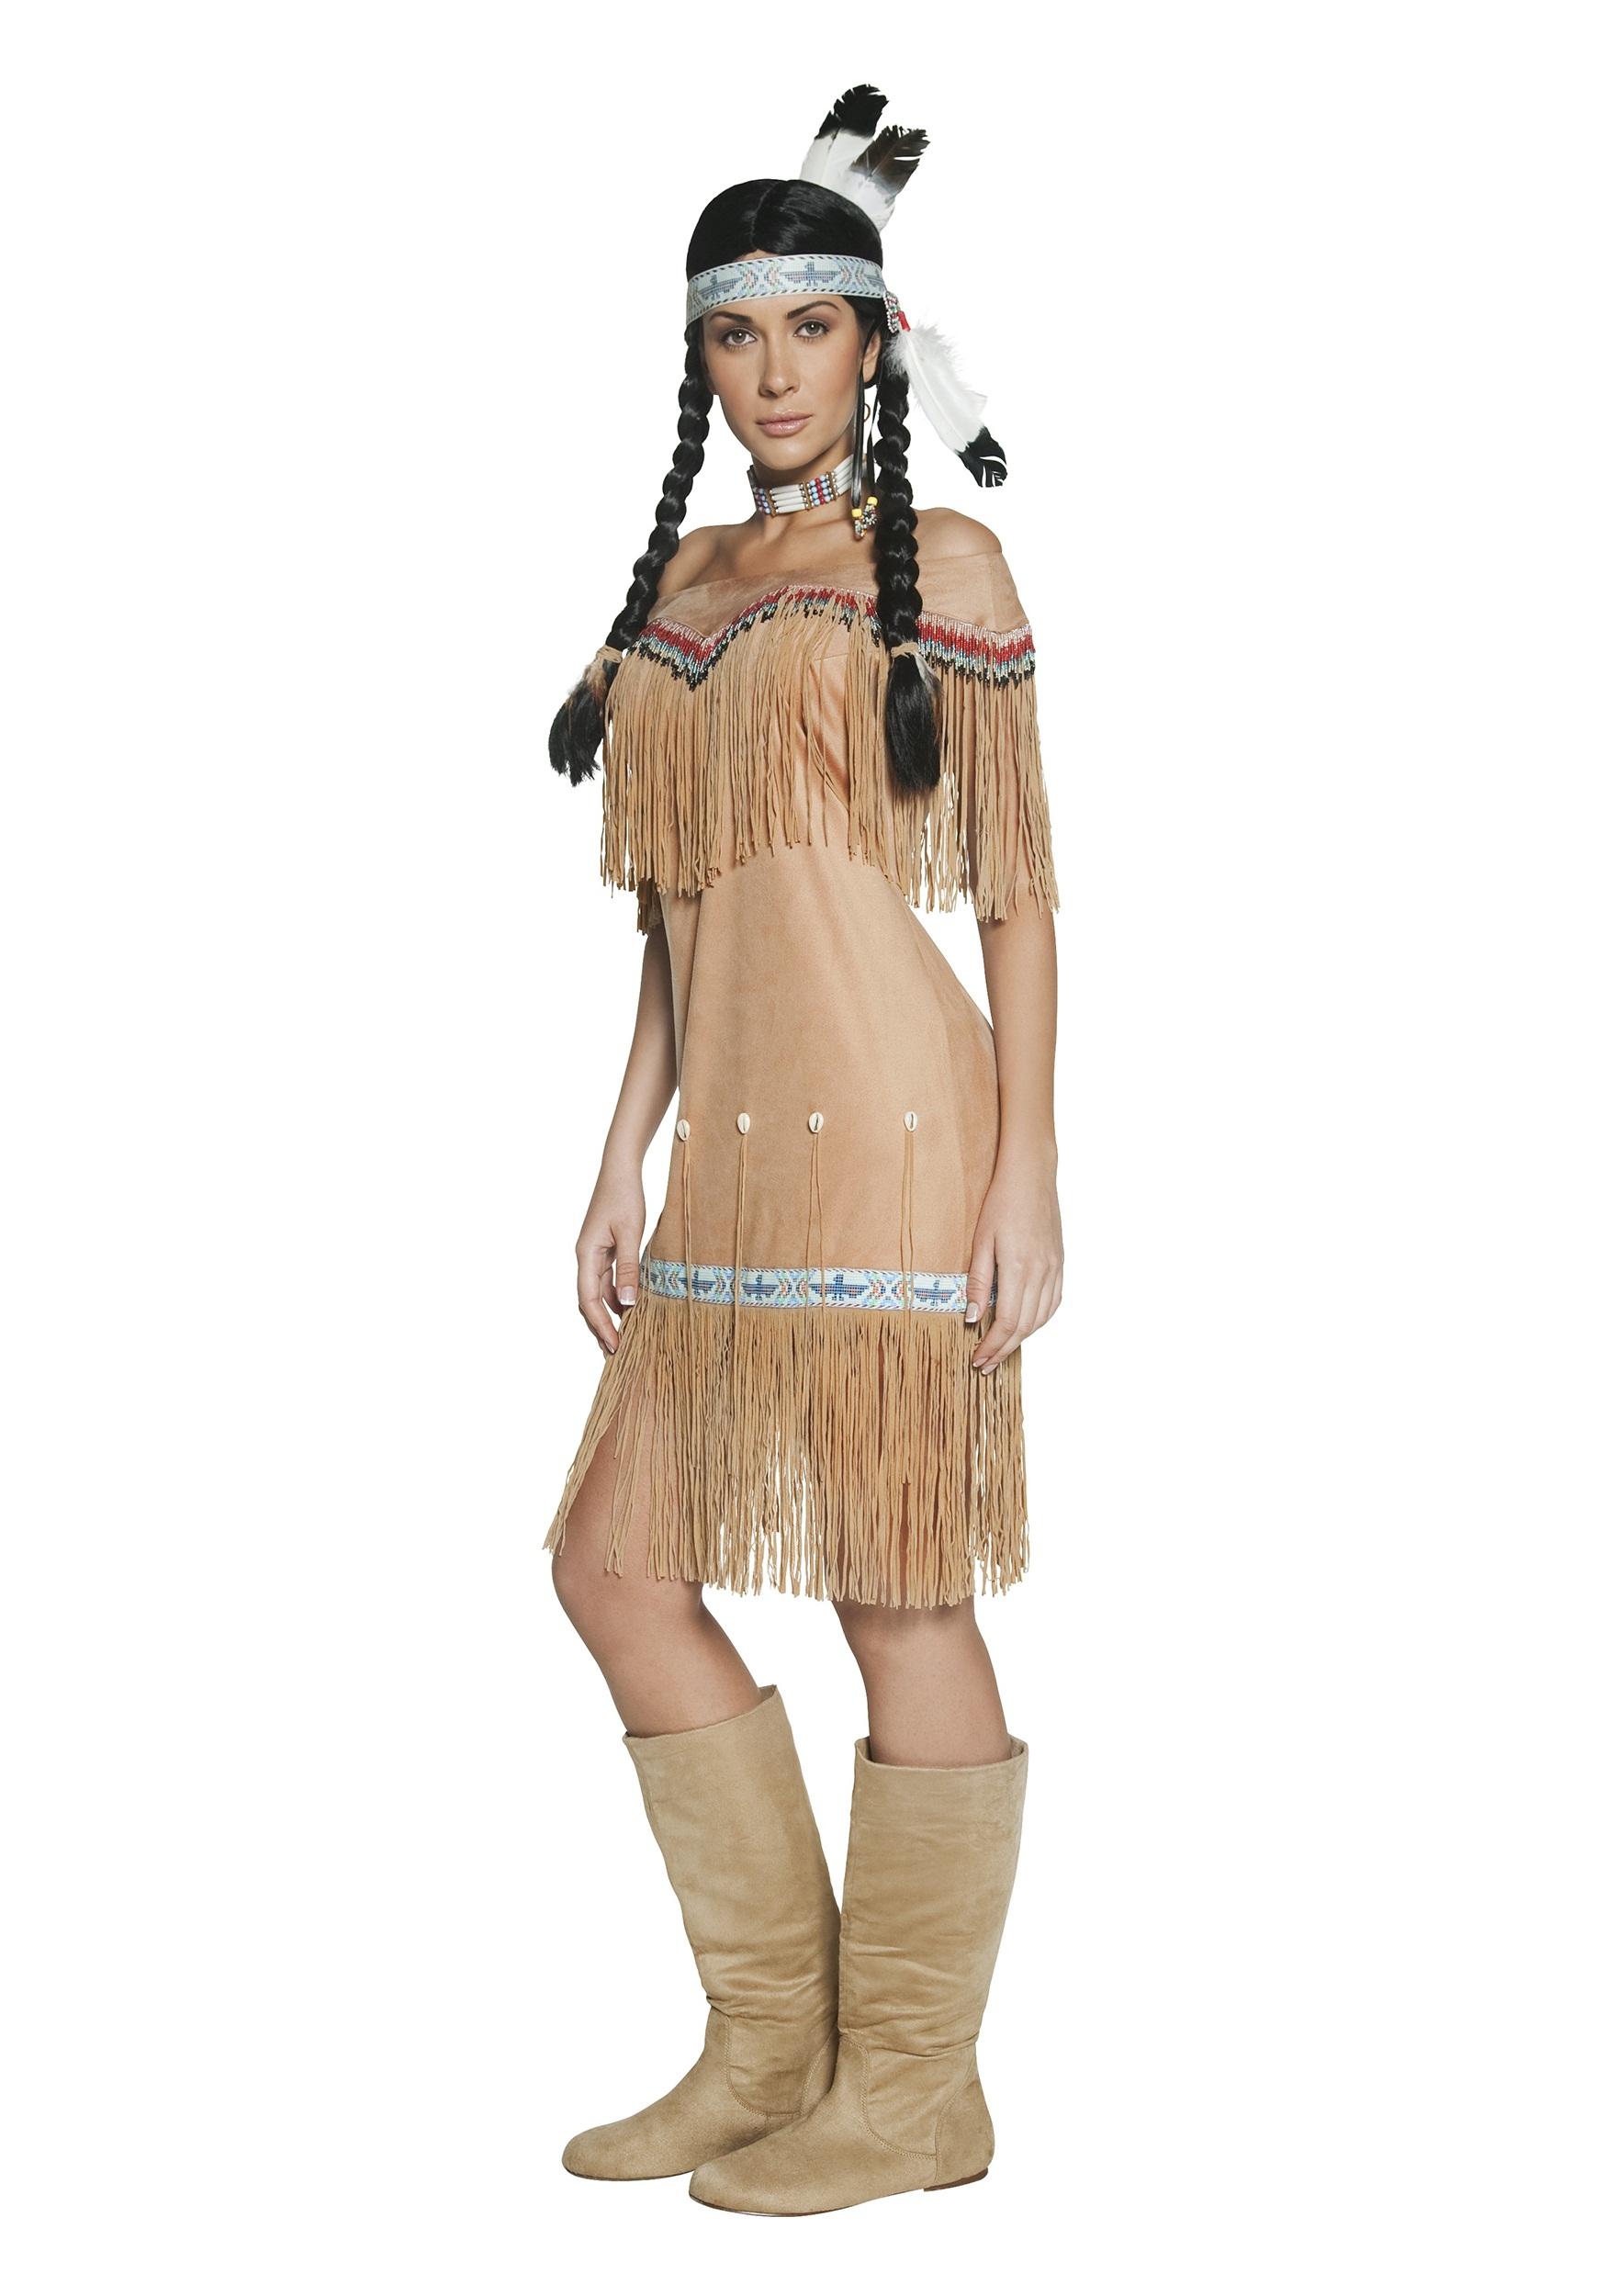 women 39 s native american costume. Black Bedroom Furniture Sets. Home Design Ideas